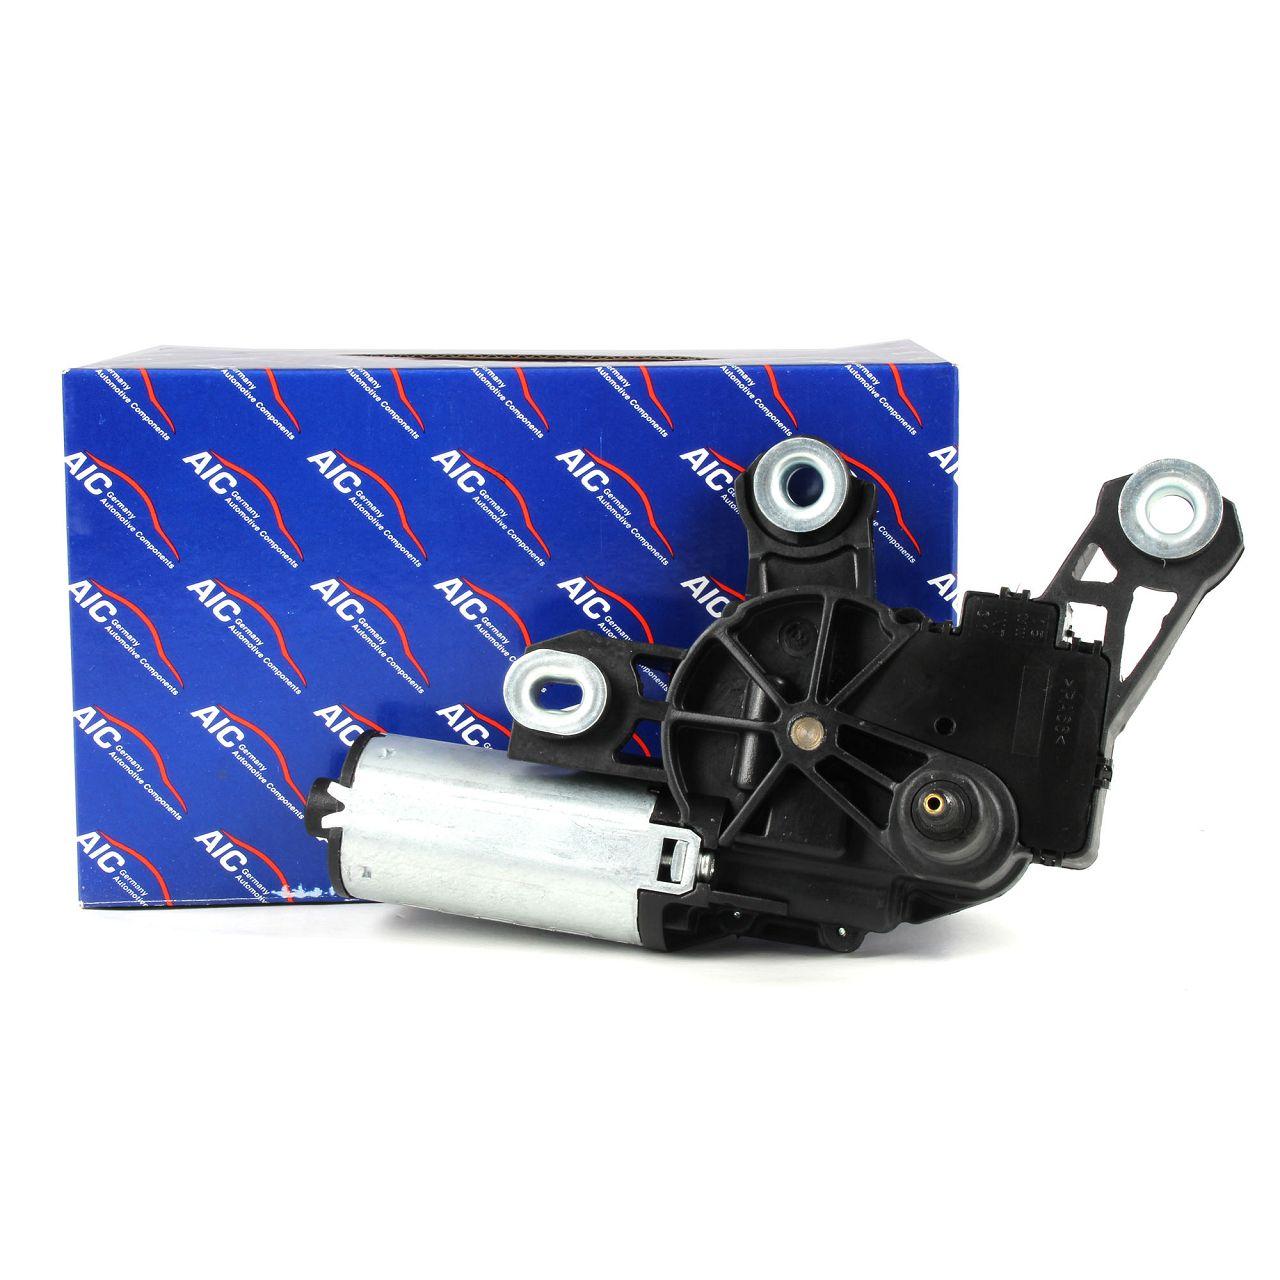 AIC Heckwischermotor für AUDI A3 (8P) A4 AVANT (B6 B7 B8) Q5 (8RB) Q7 (4L)